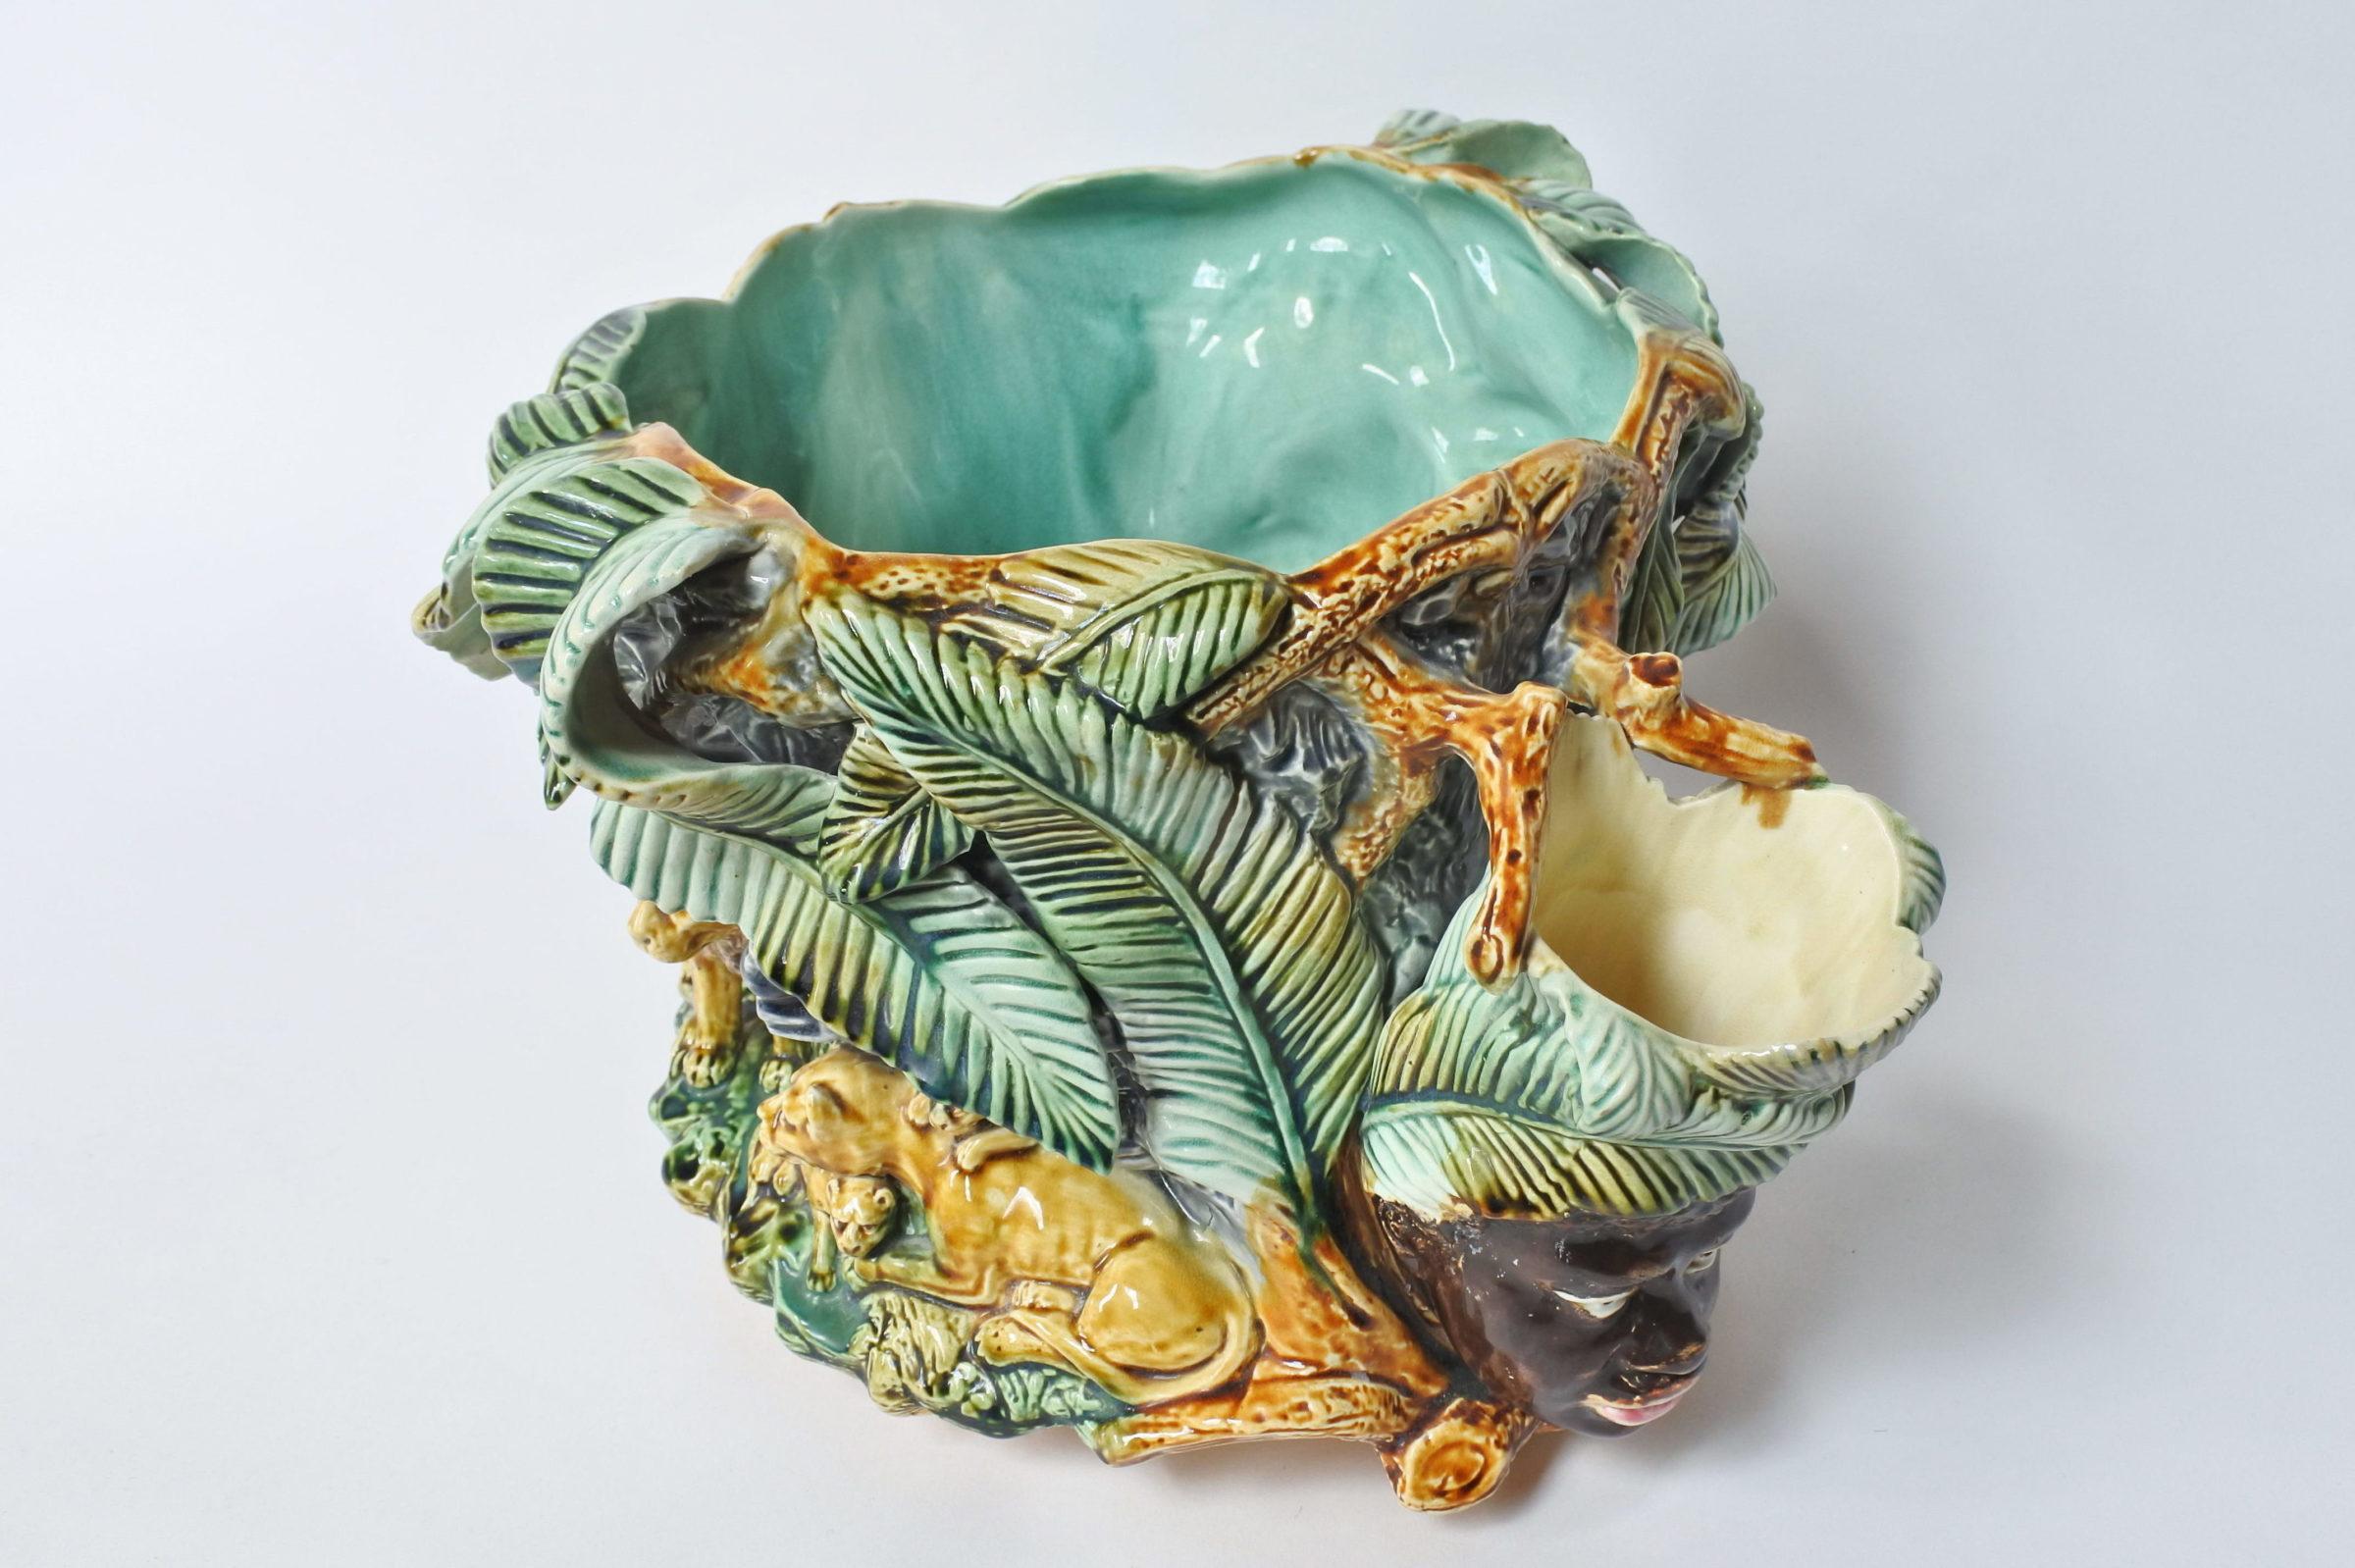 Centrotavola in ceramica barbotine con funzione di jardinière - Onnaing - 9